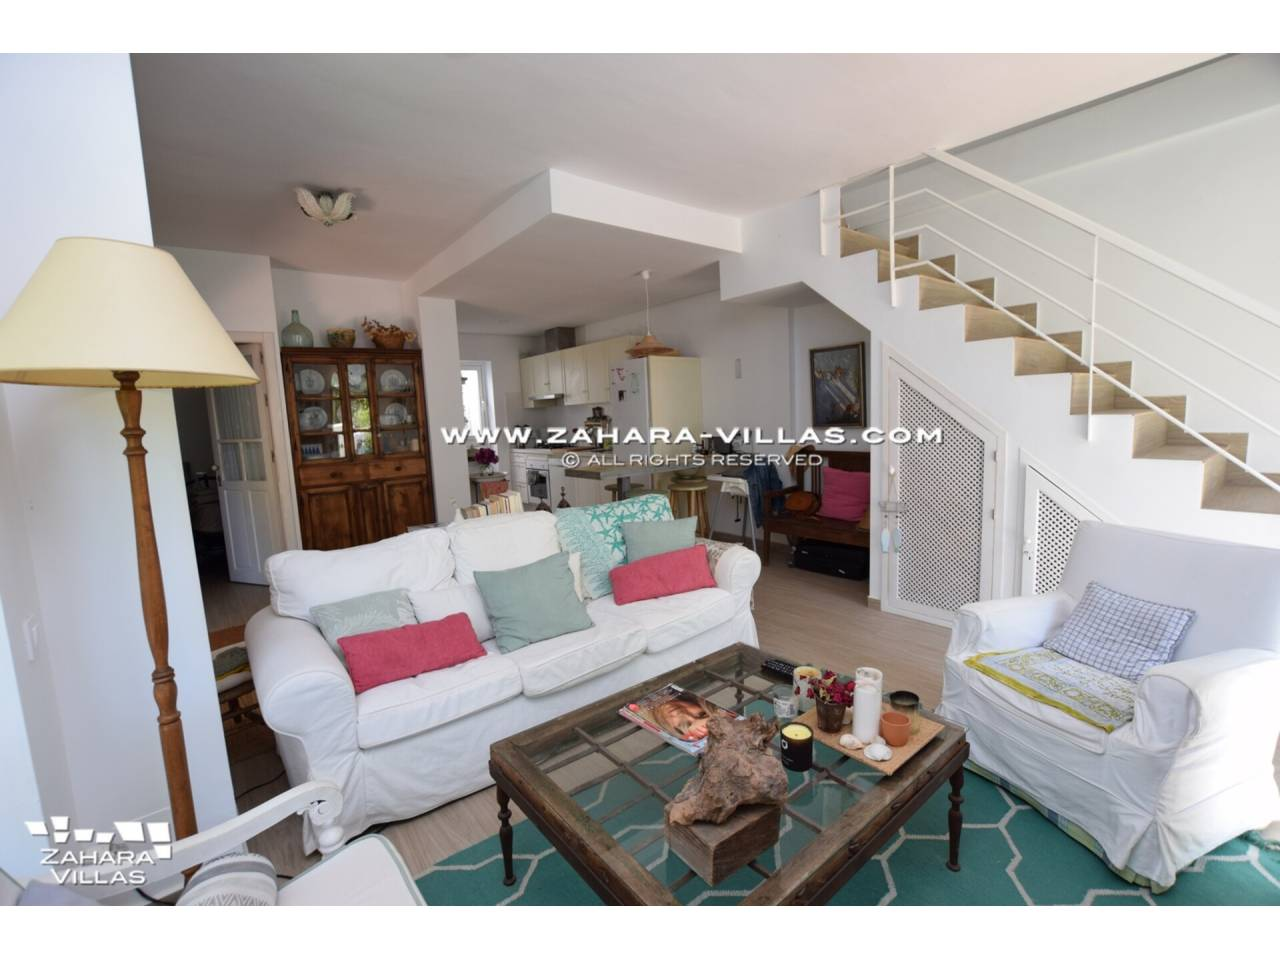 Imagen 12 de House for sale close to the beach, with sea views in Zahara de los Atunes